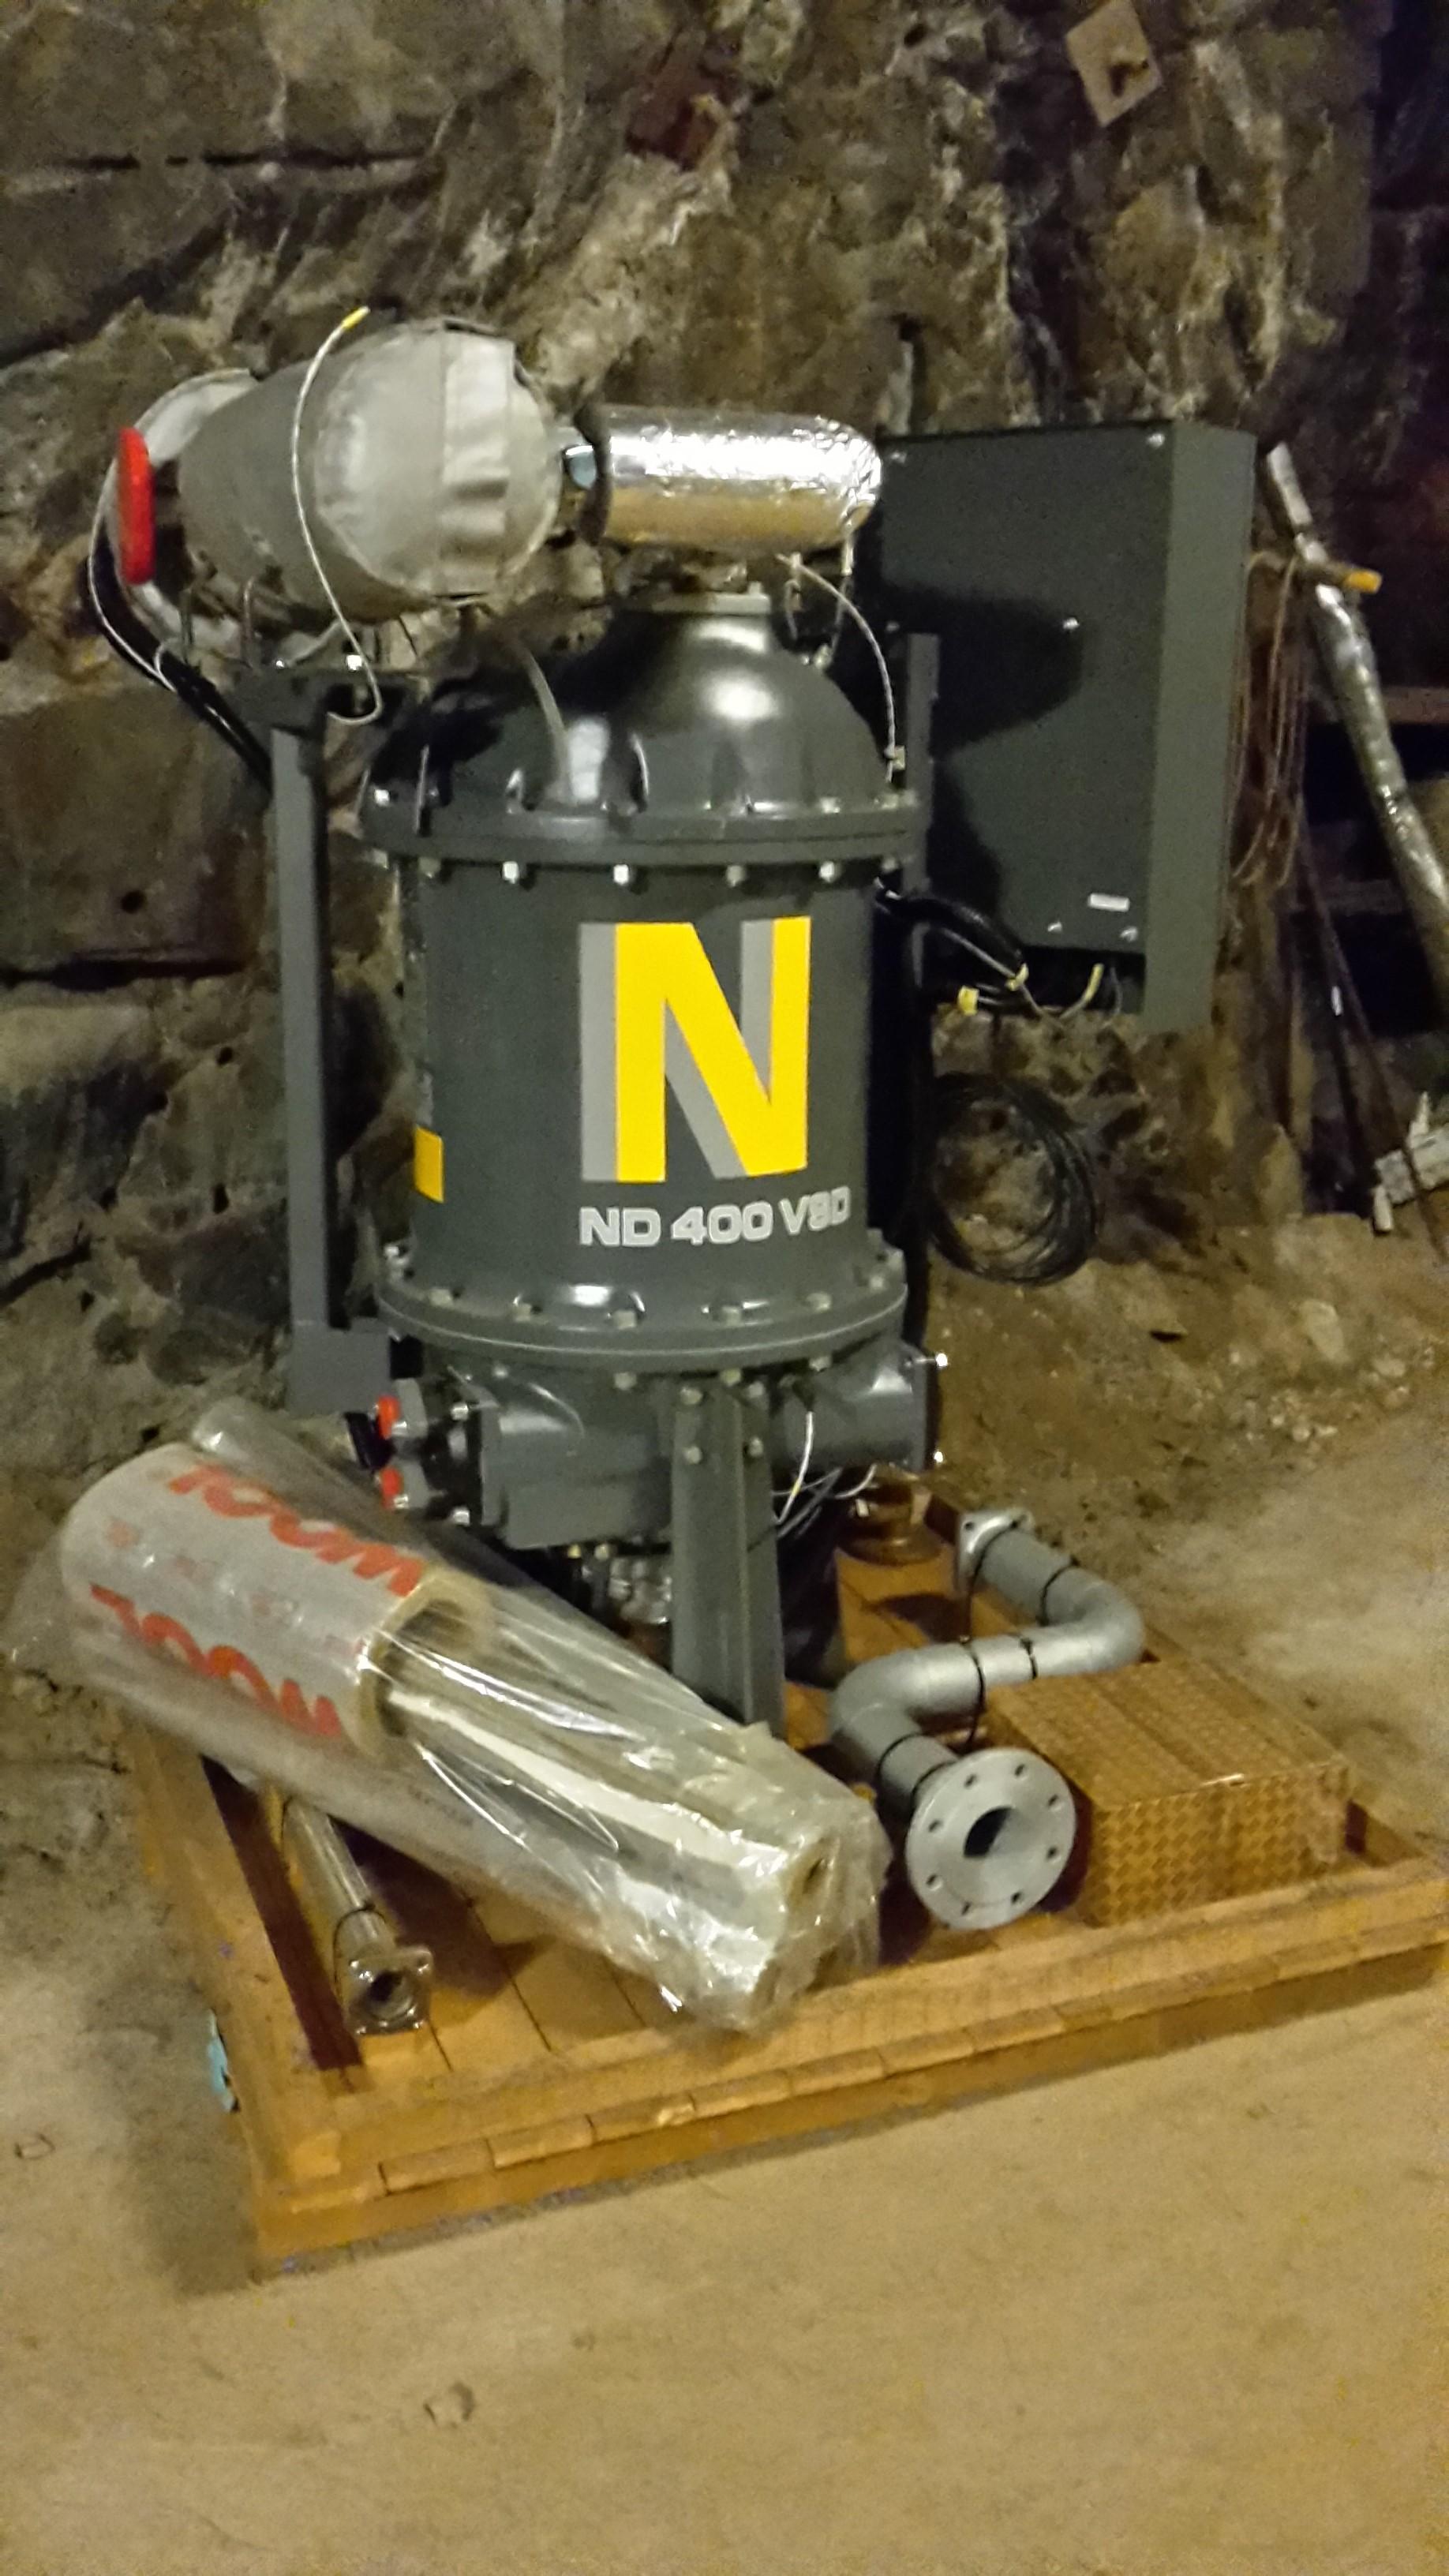 Atlas Copco ND 400 VSD, Compressed air dryers, Industrial